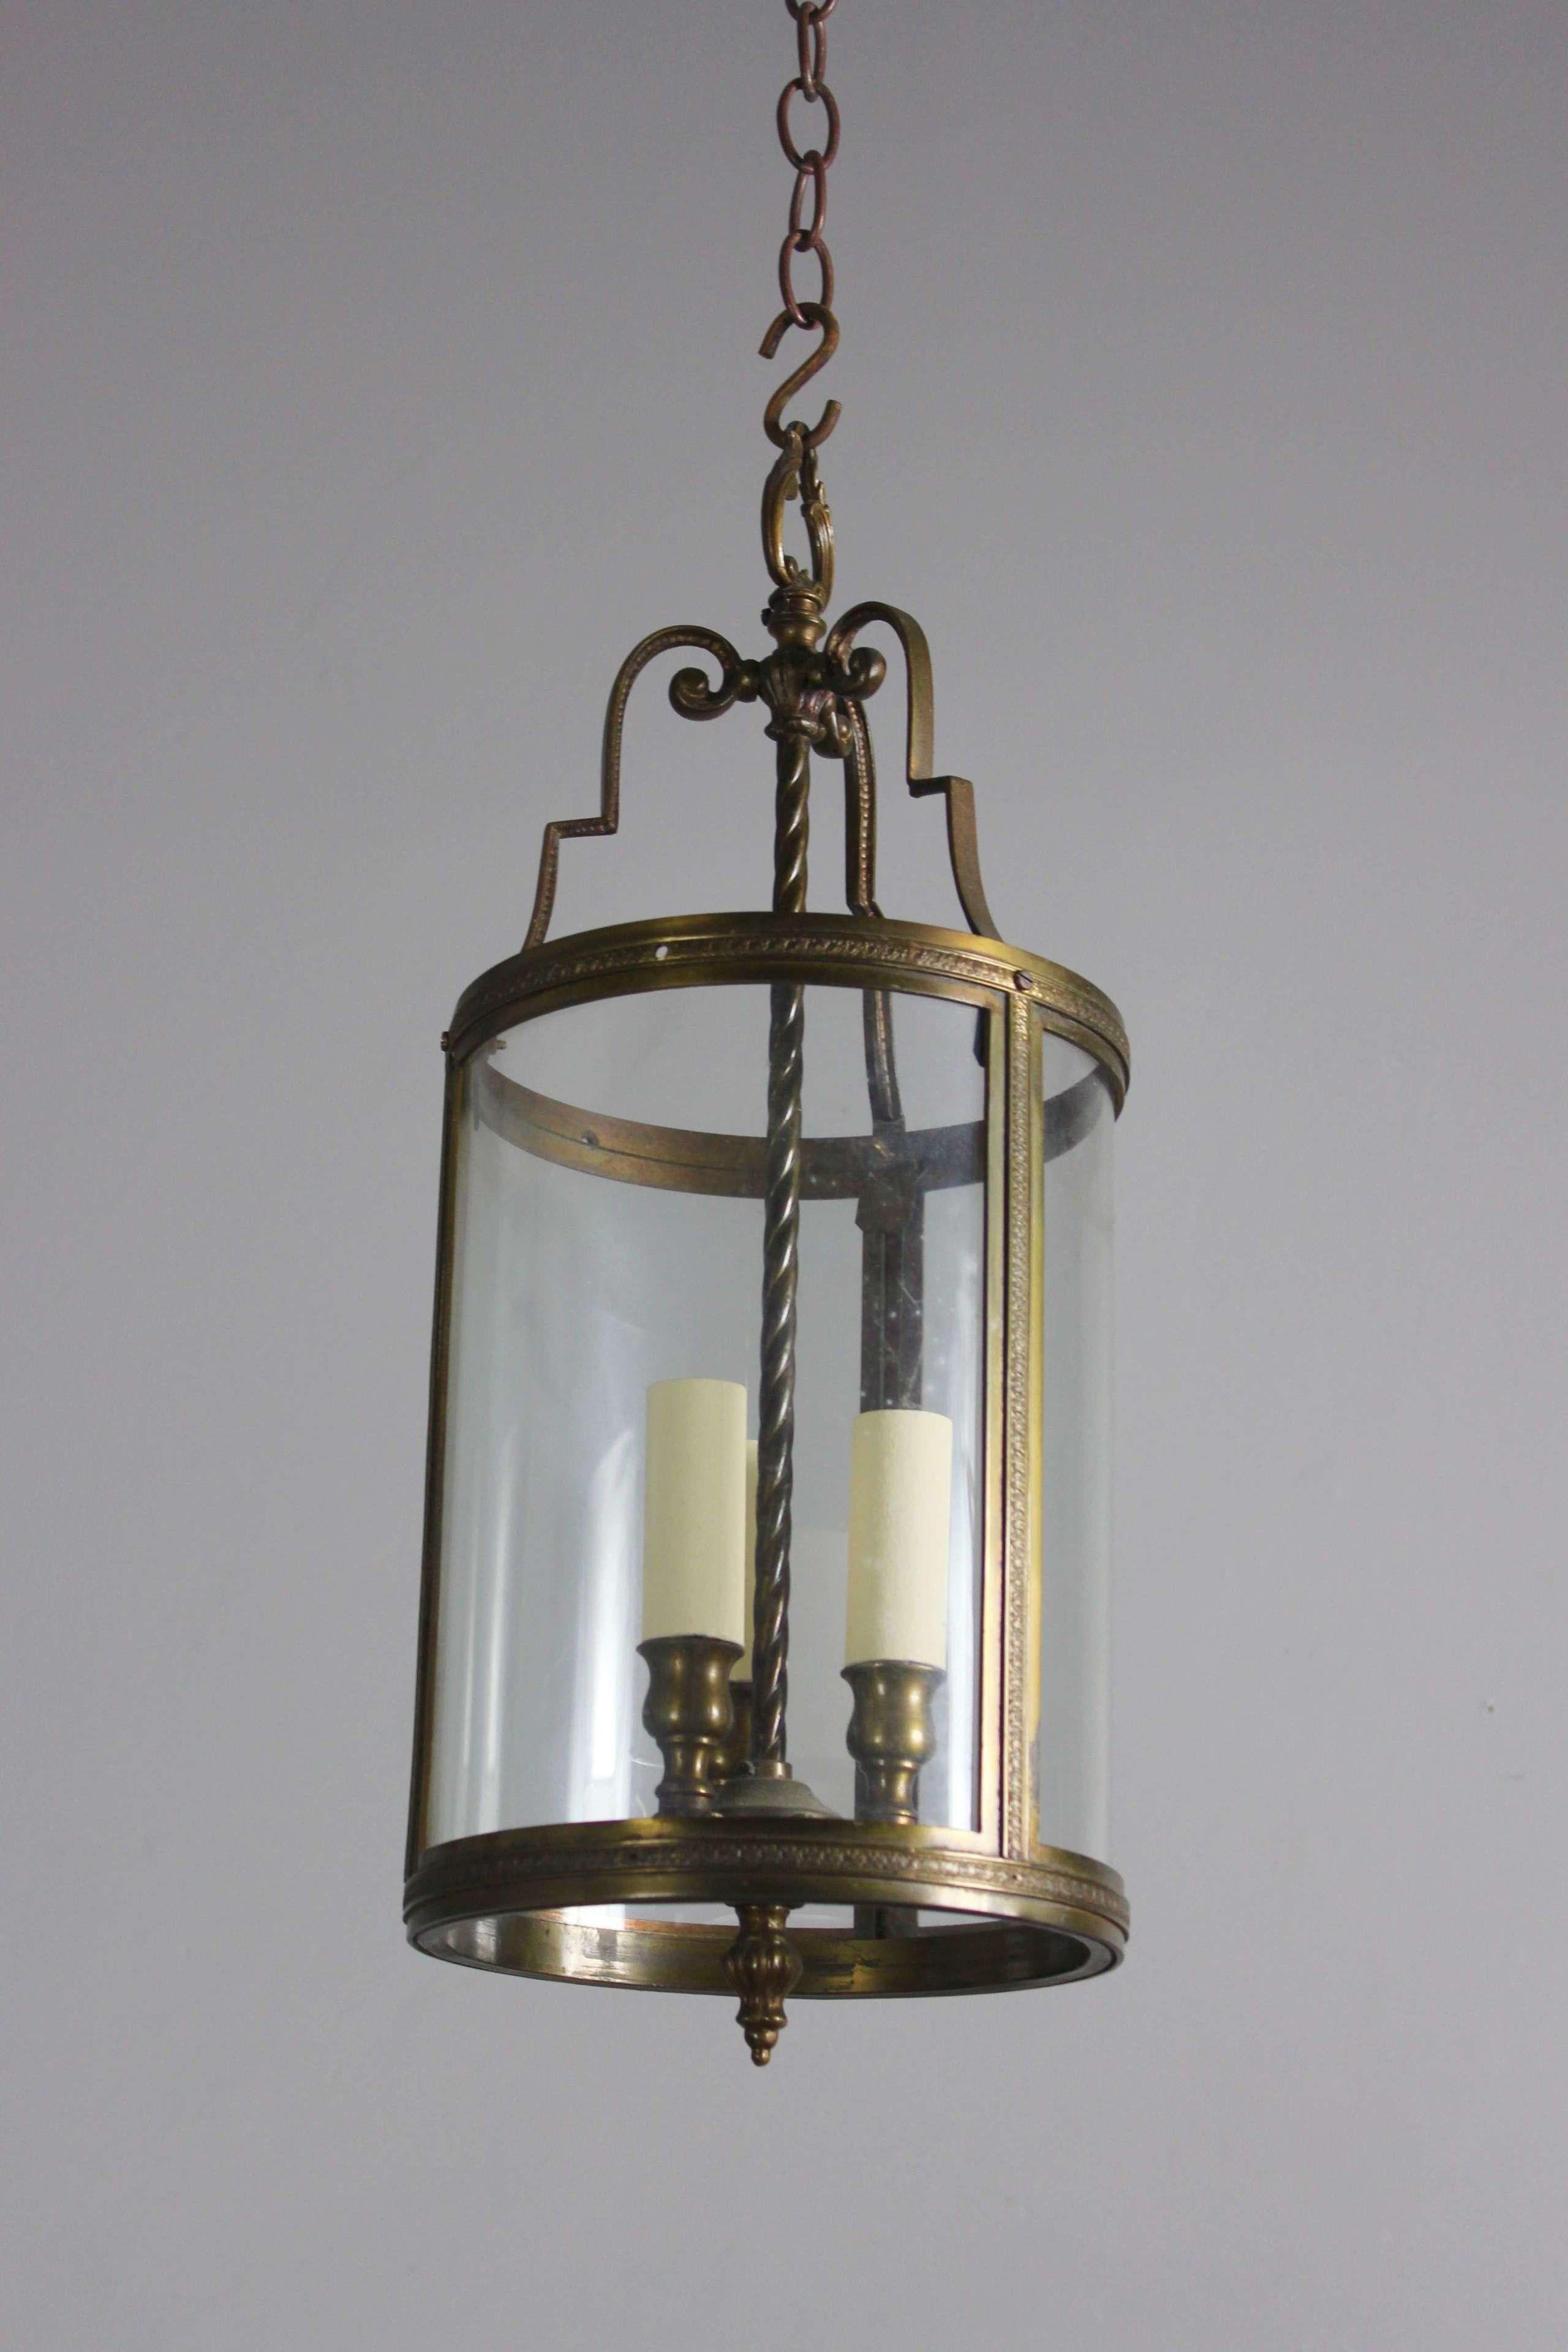 Smaller circular glass lobby lantern